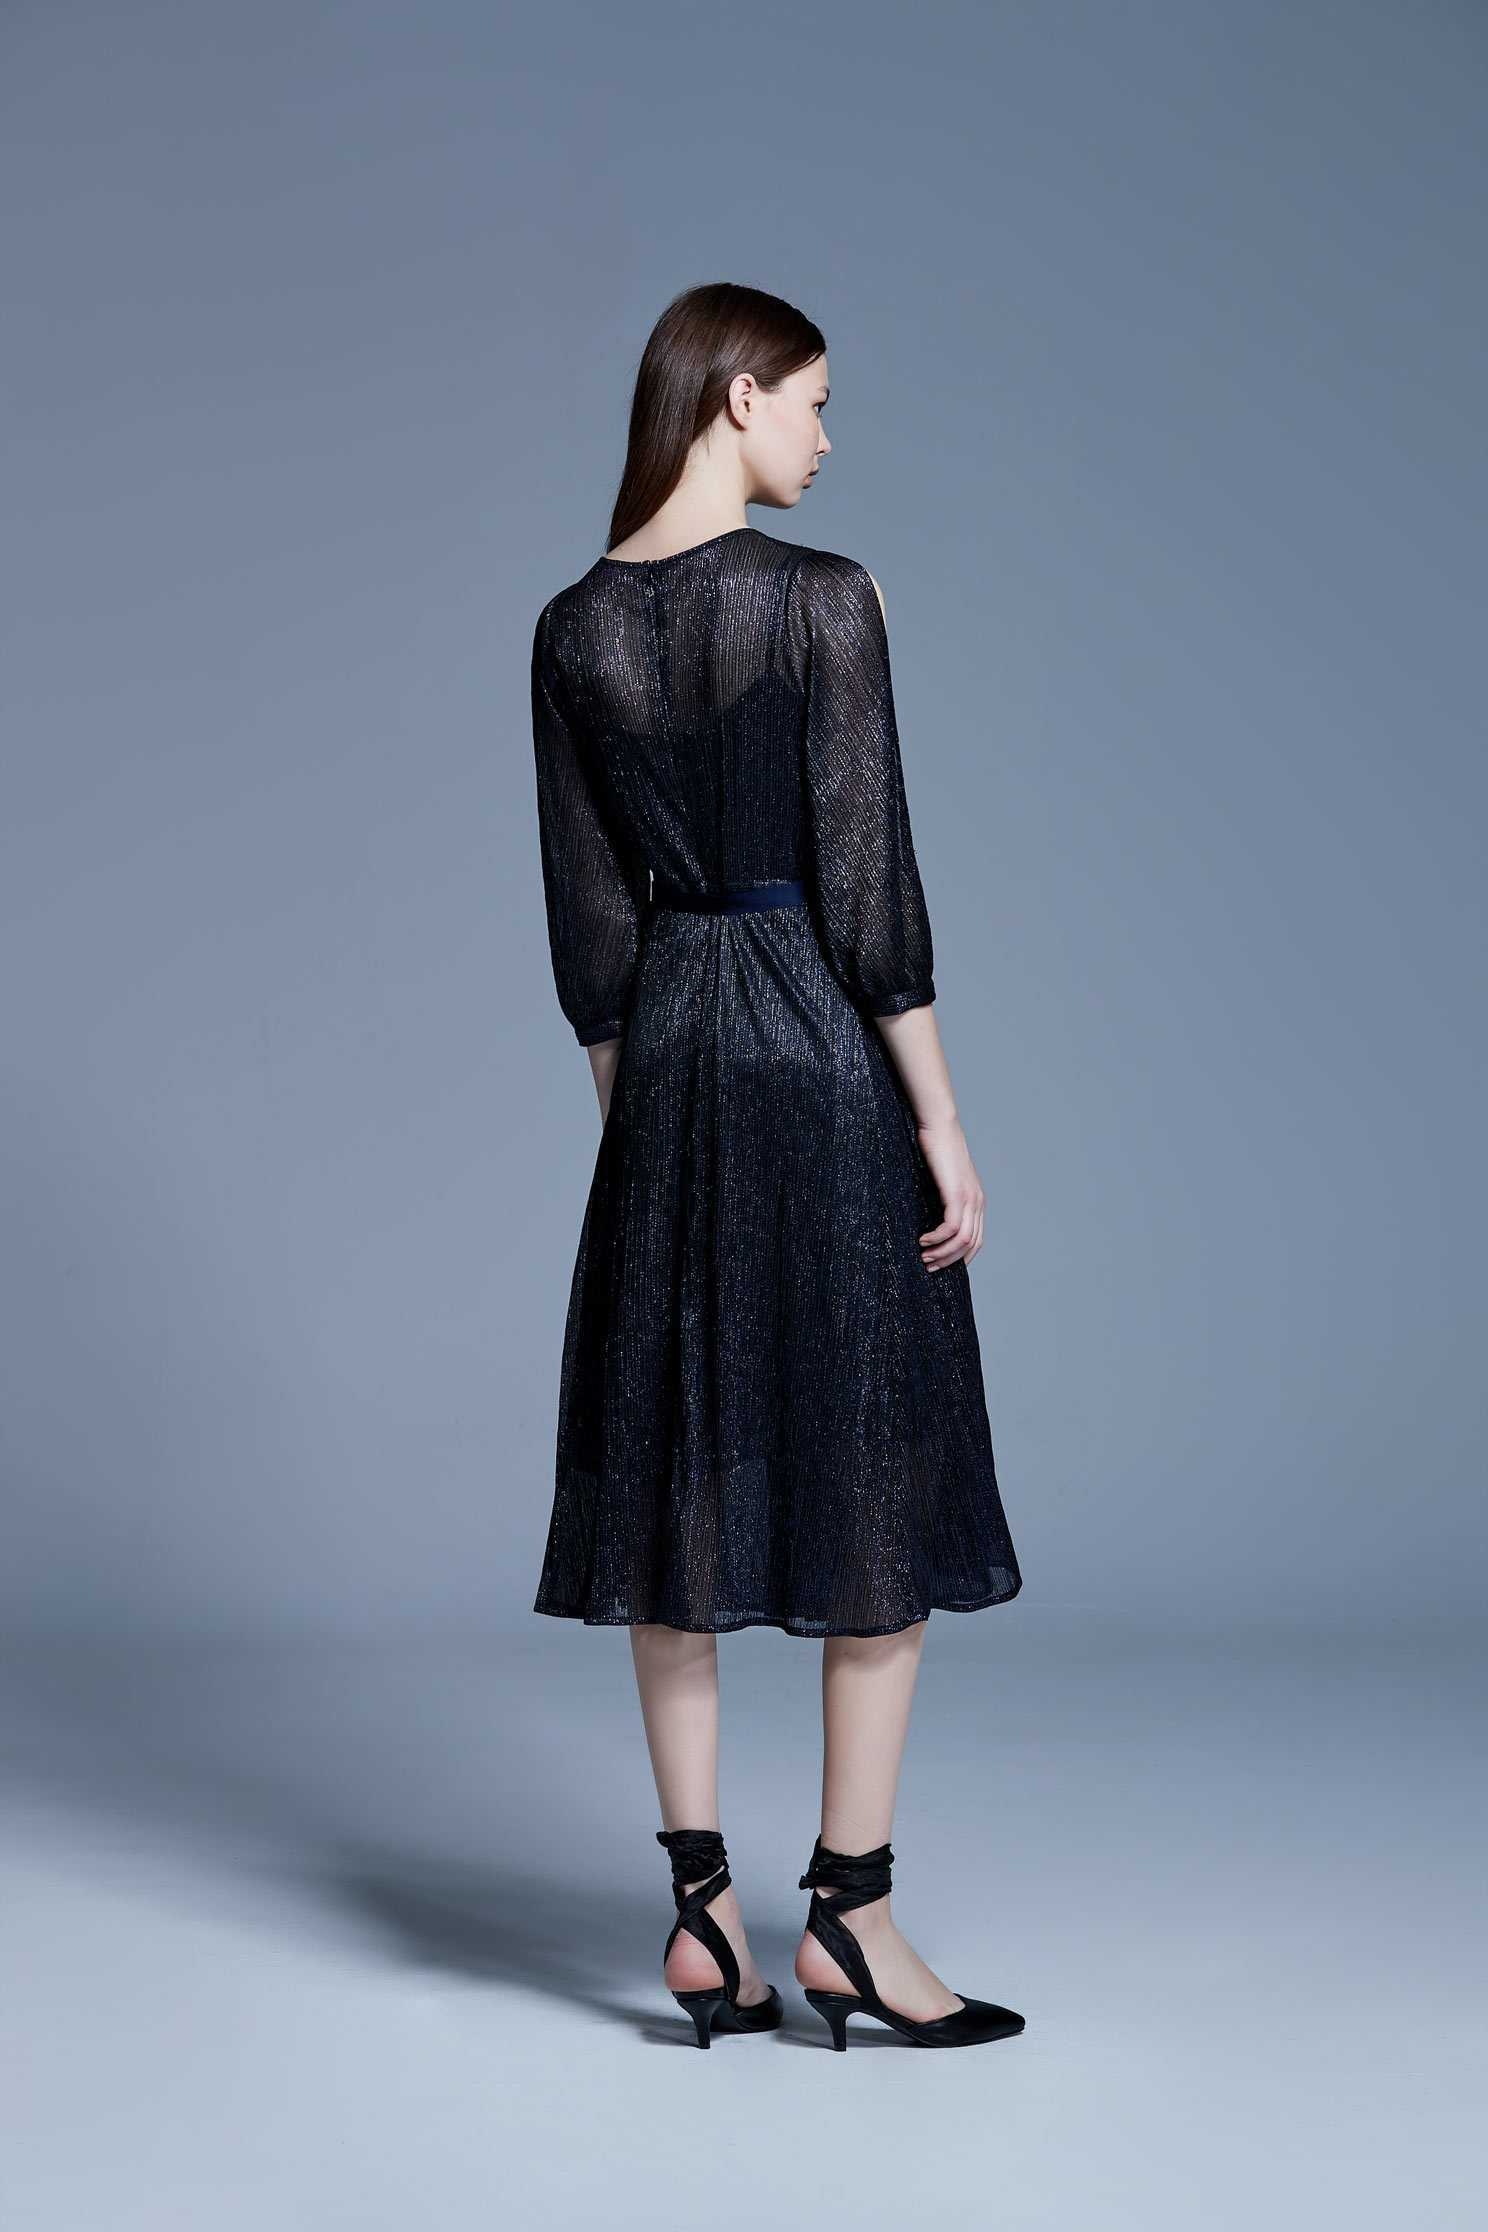 Pleated off-shoulder dress,V-neck dress,Cocktail Dress,Evening Wear,Long dress,長袖洋裝,Black dress